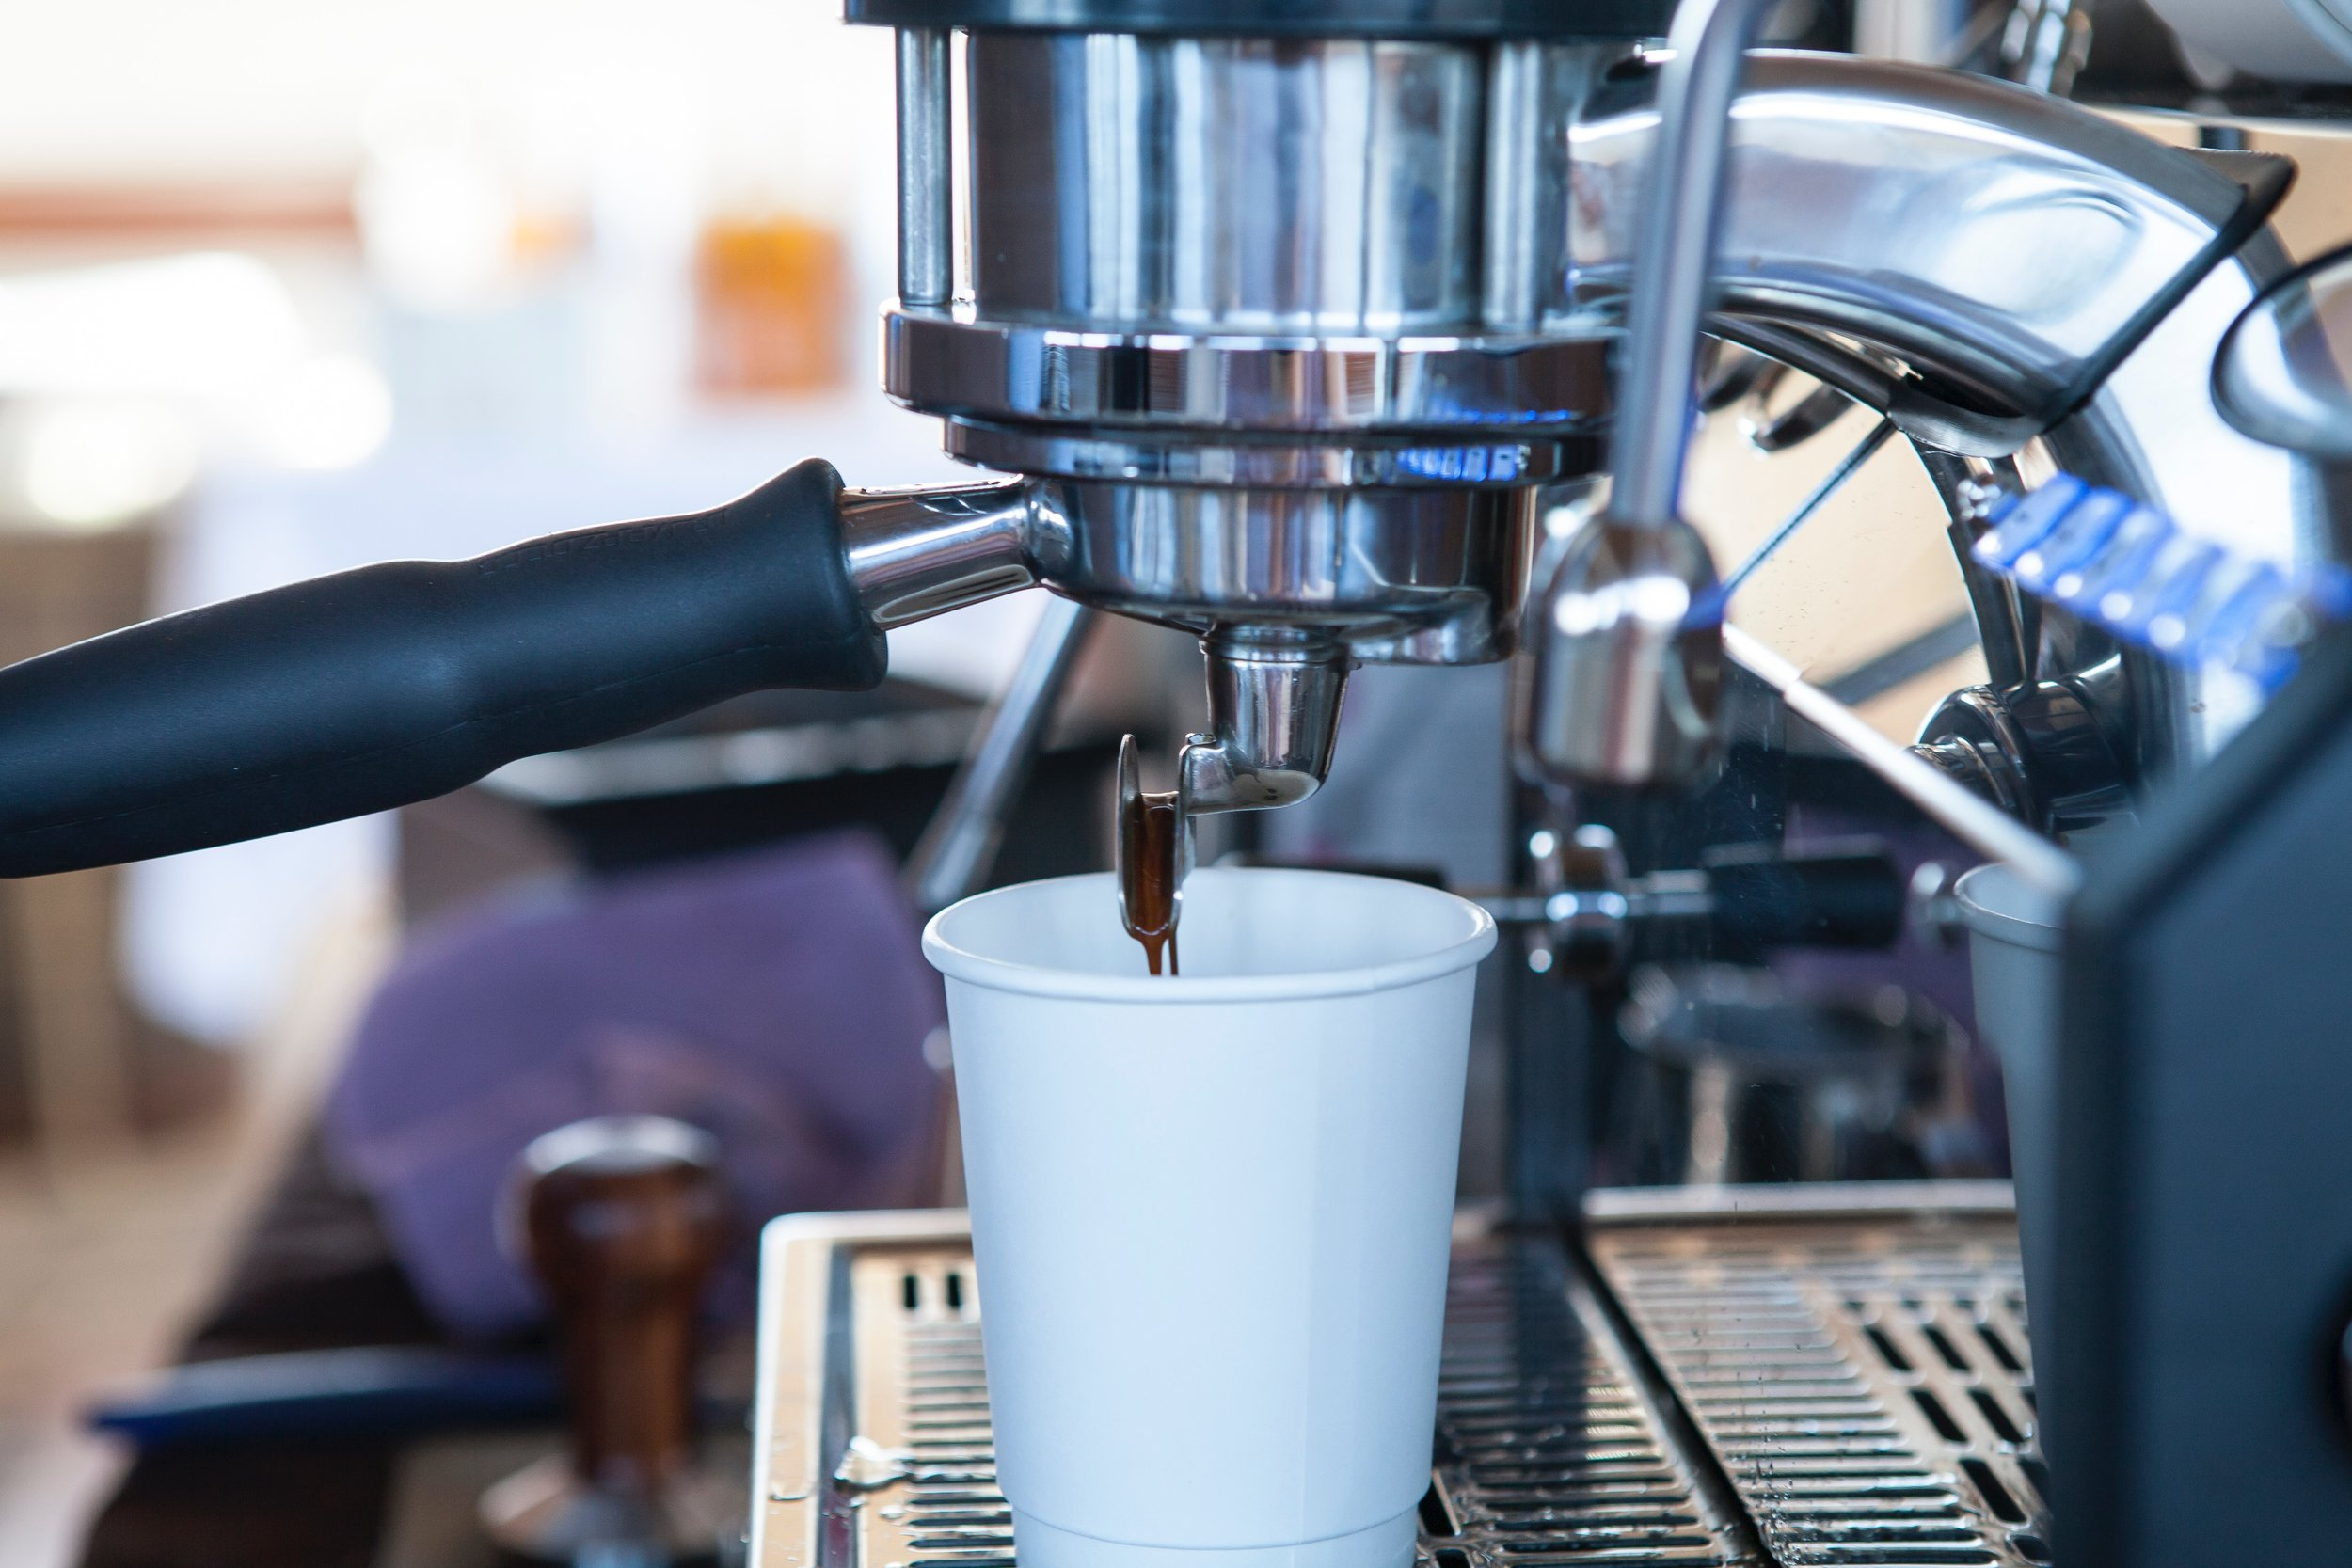 bar-caffeine-coffee-298845.jpg